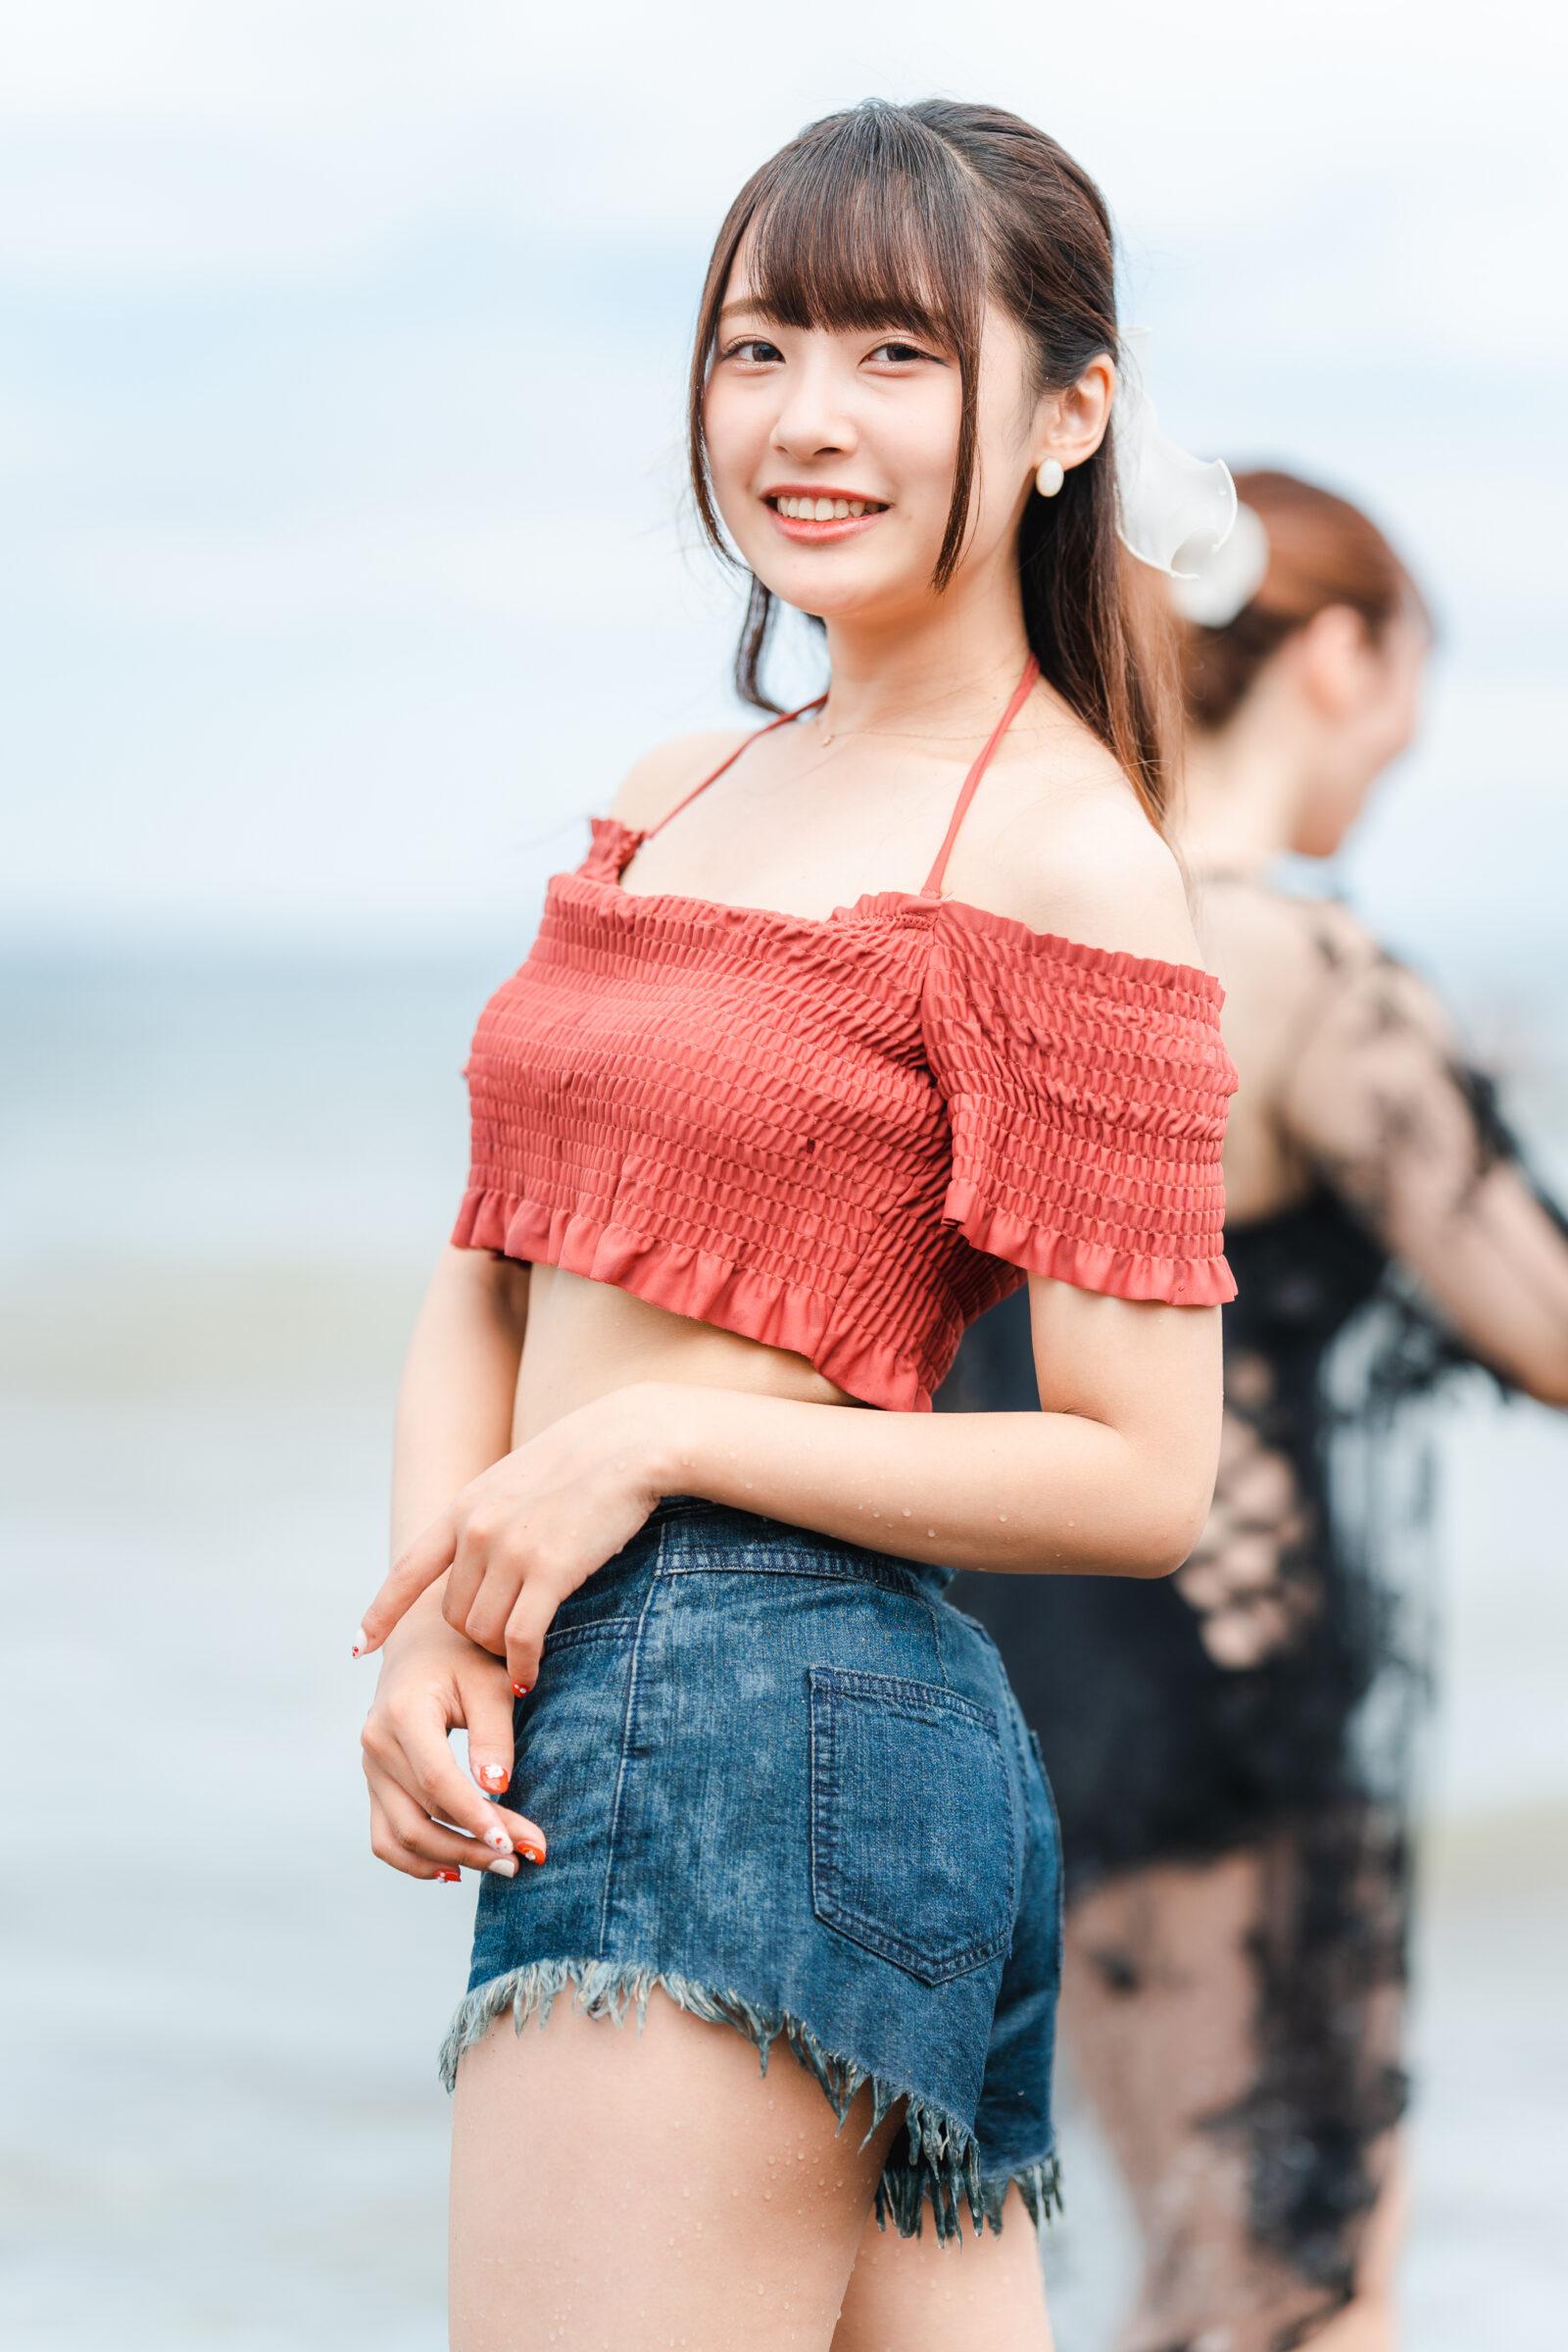 HAPPY少女♪ ちひろ ( 孫田ちひろ )   ライブプロ海イベント2021水着撮影会